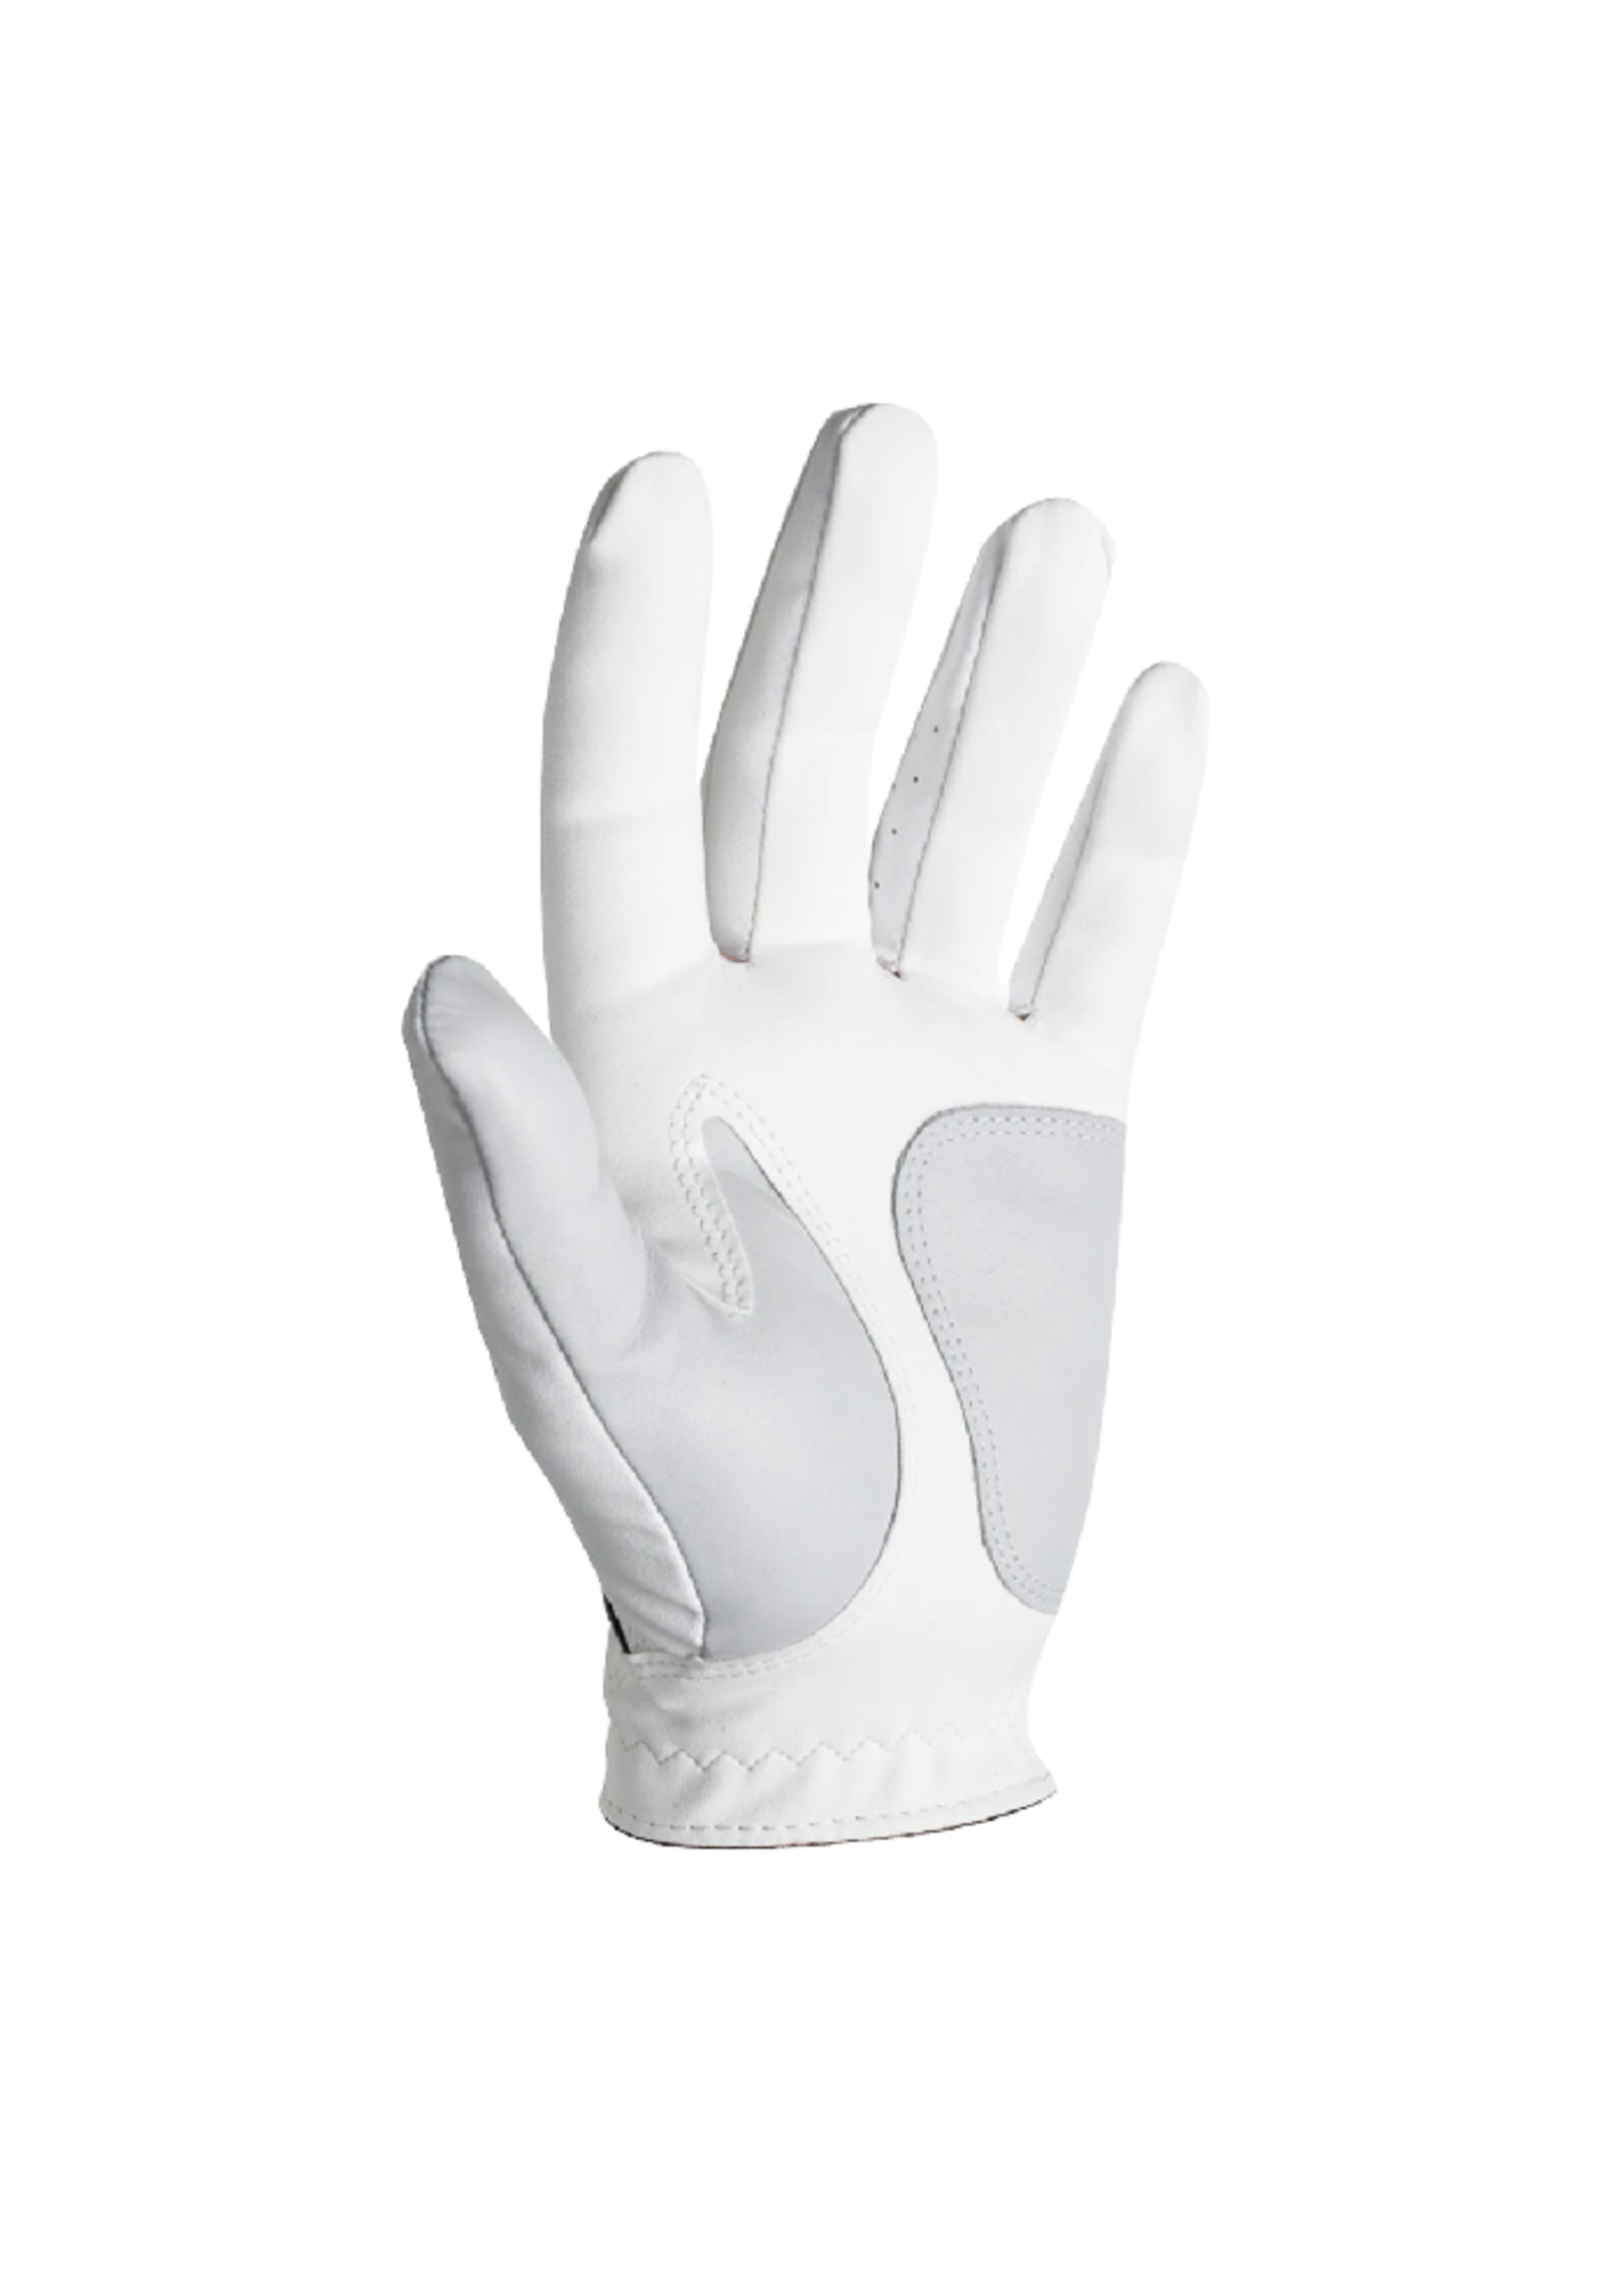 FJ WeatherSof Glove Right Hand Men